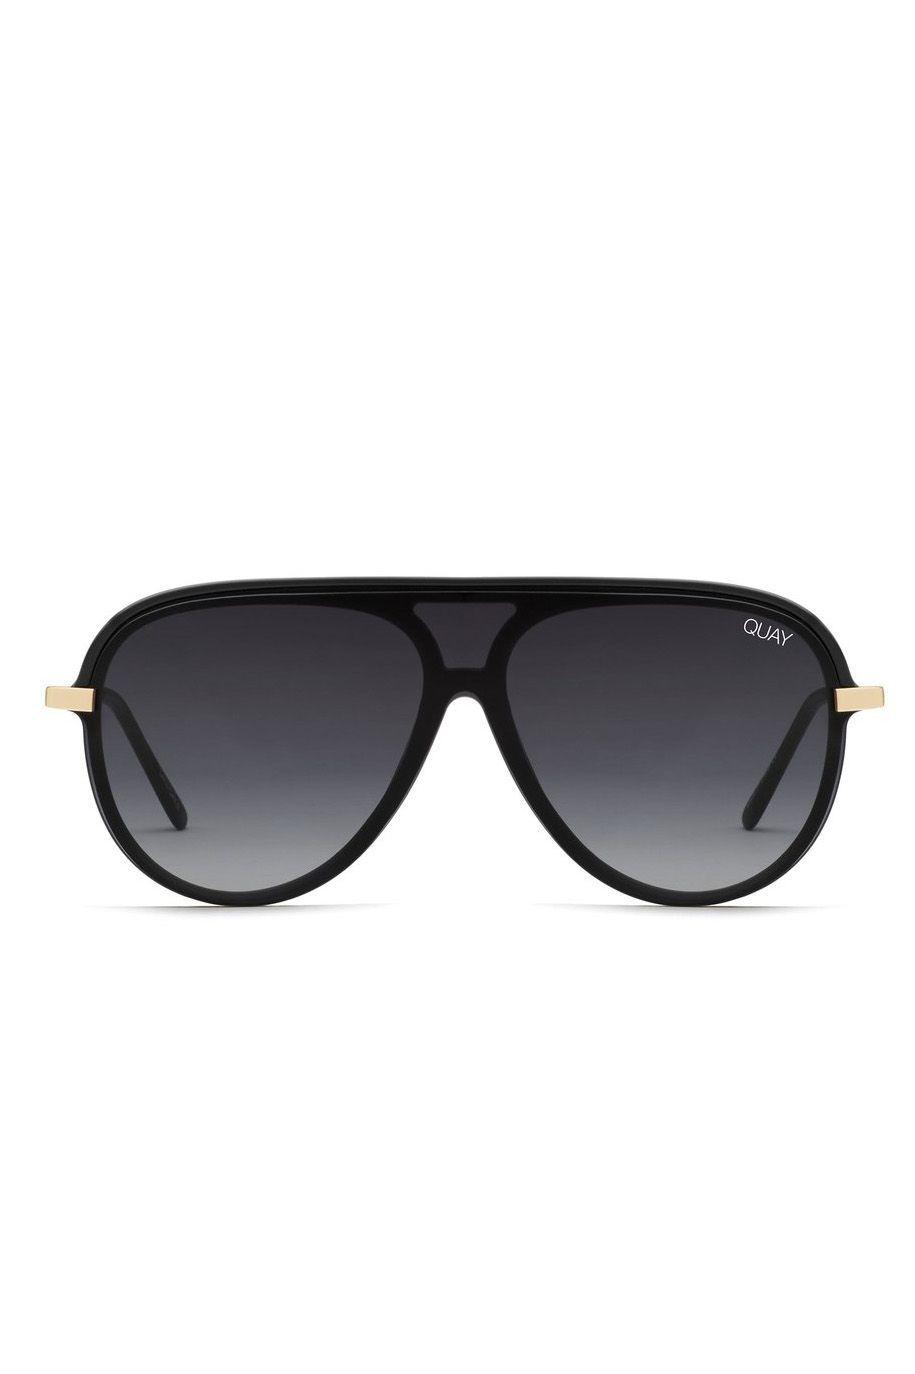 60703f7c946a0 15 Best New Sunglasses Brands of 2018 - Best Designer Sunglasses for Women